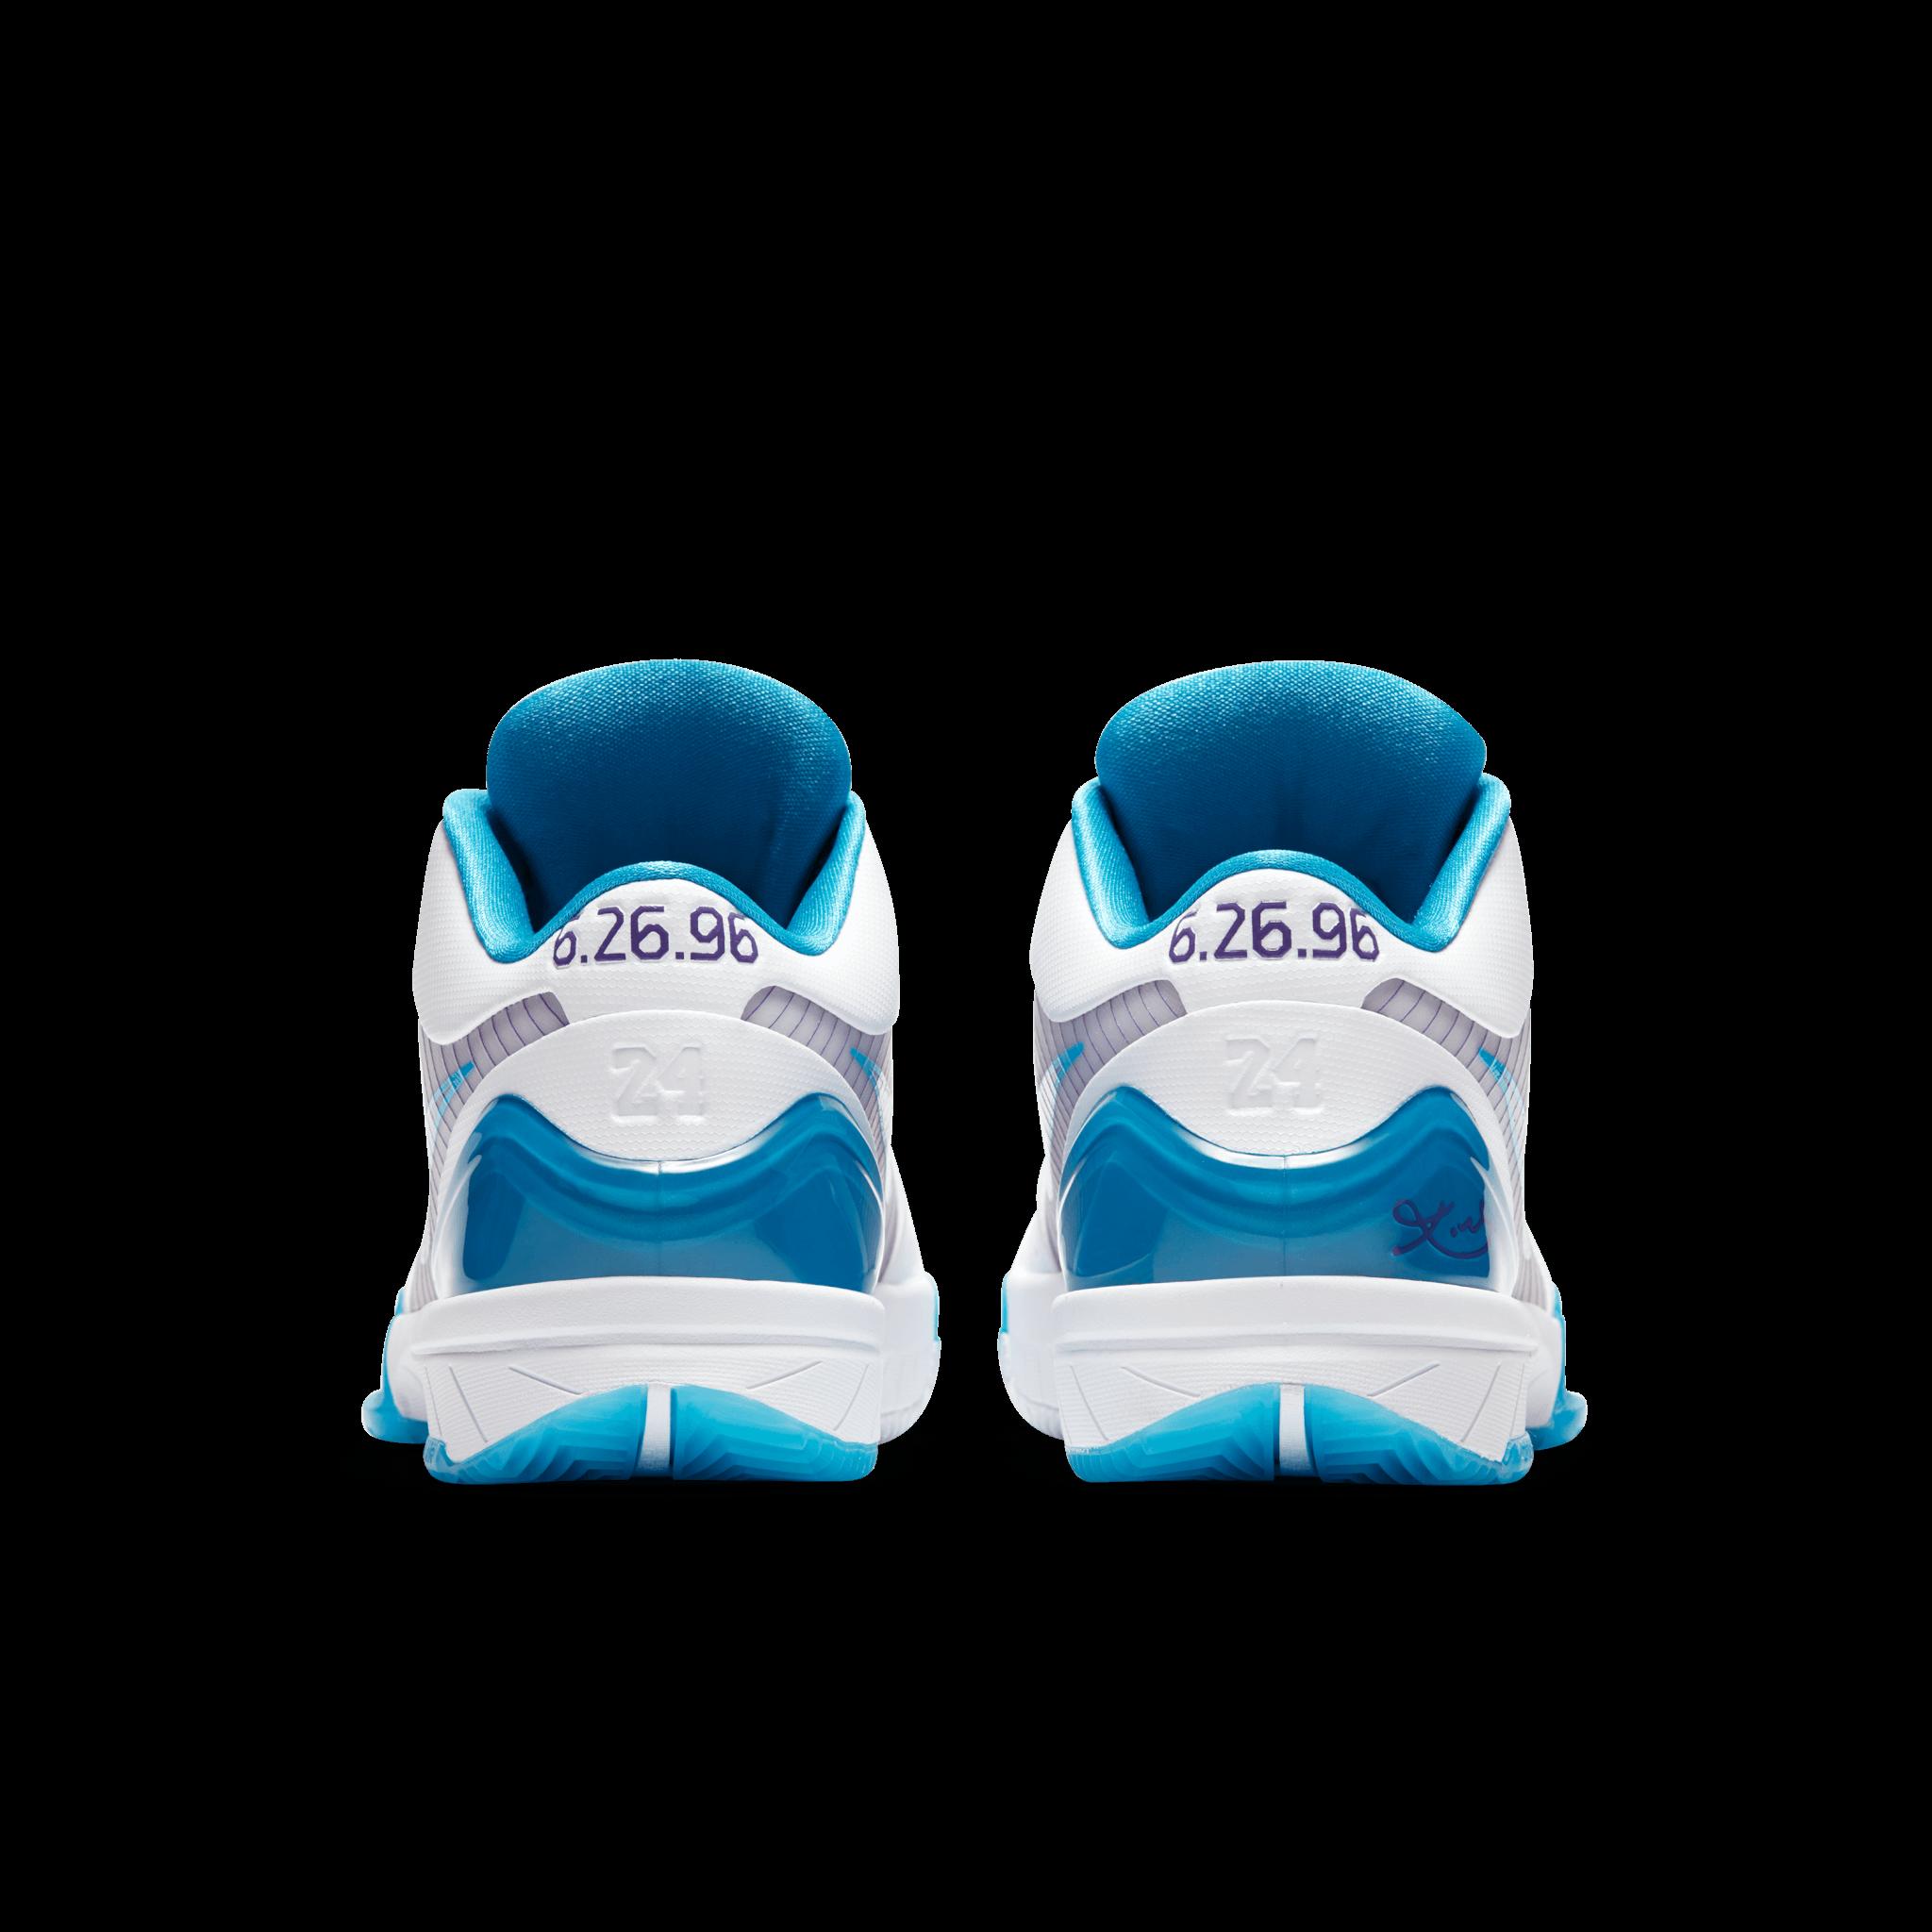 a35735017d3fa Nike Kobe 4 Protro Performance Review